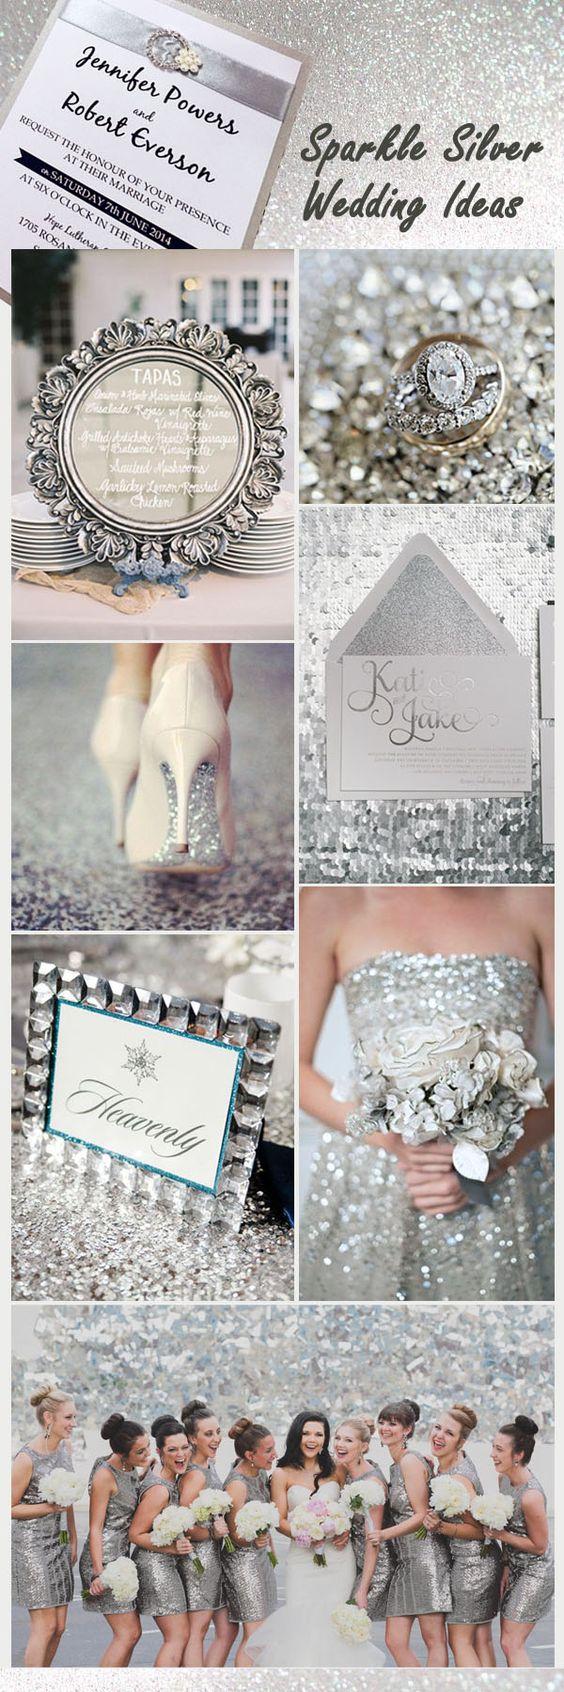 sparkle silver sequin sparkle wedding ideas and invitations